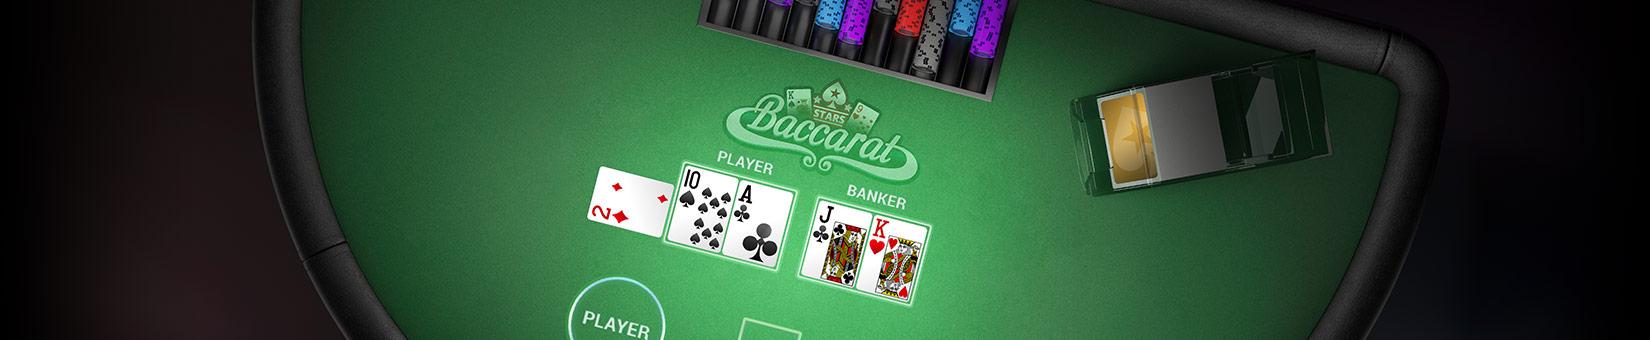 Paf Game Studio es jugador profesional de ruleta-426770